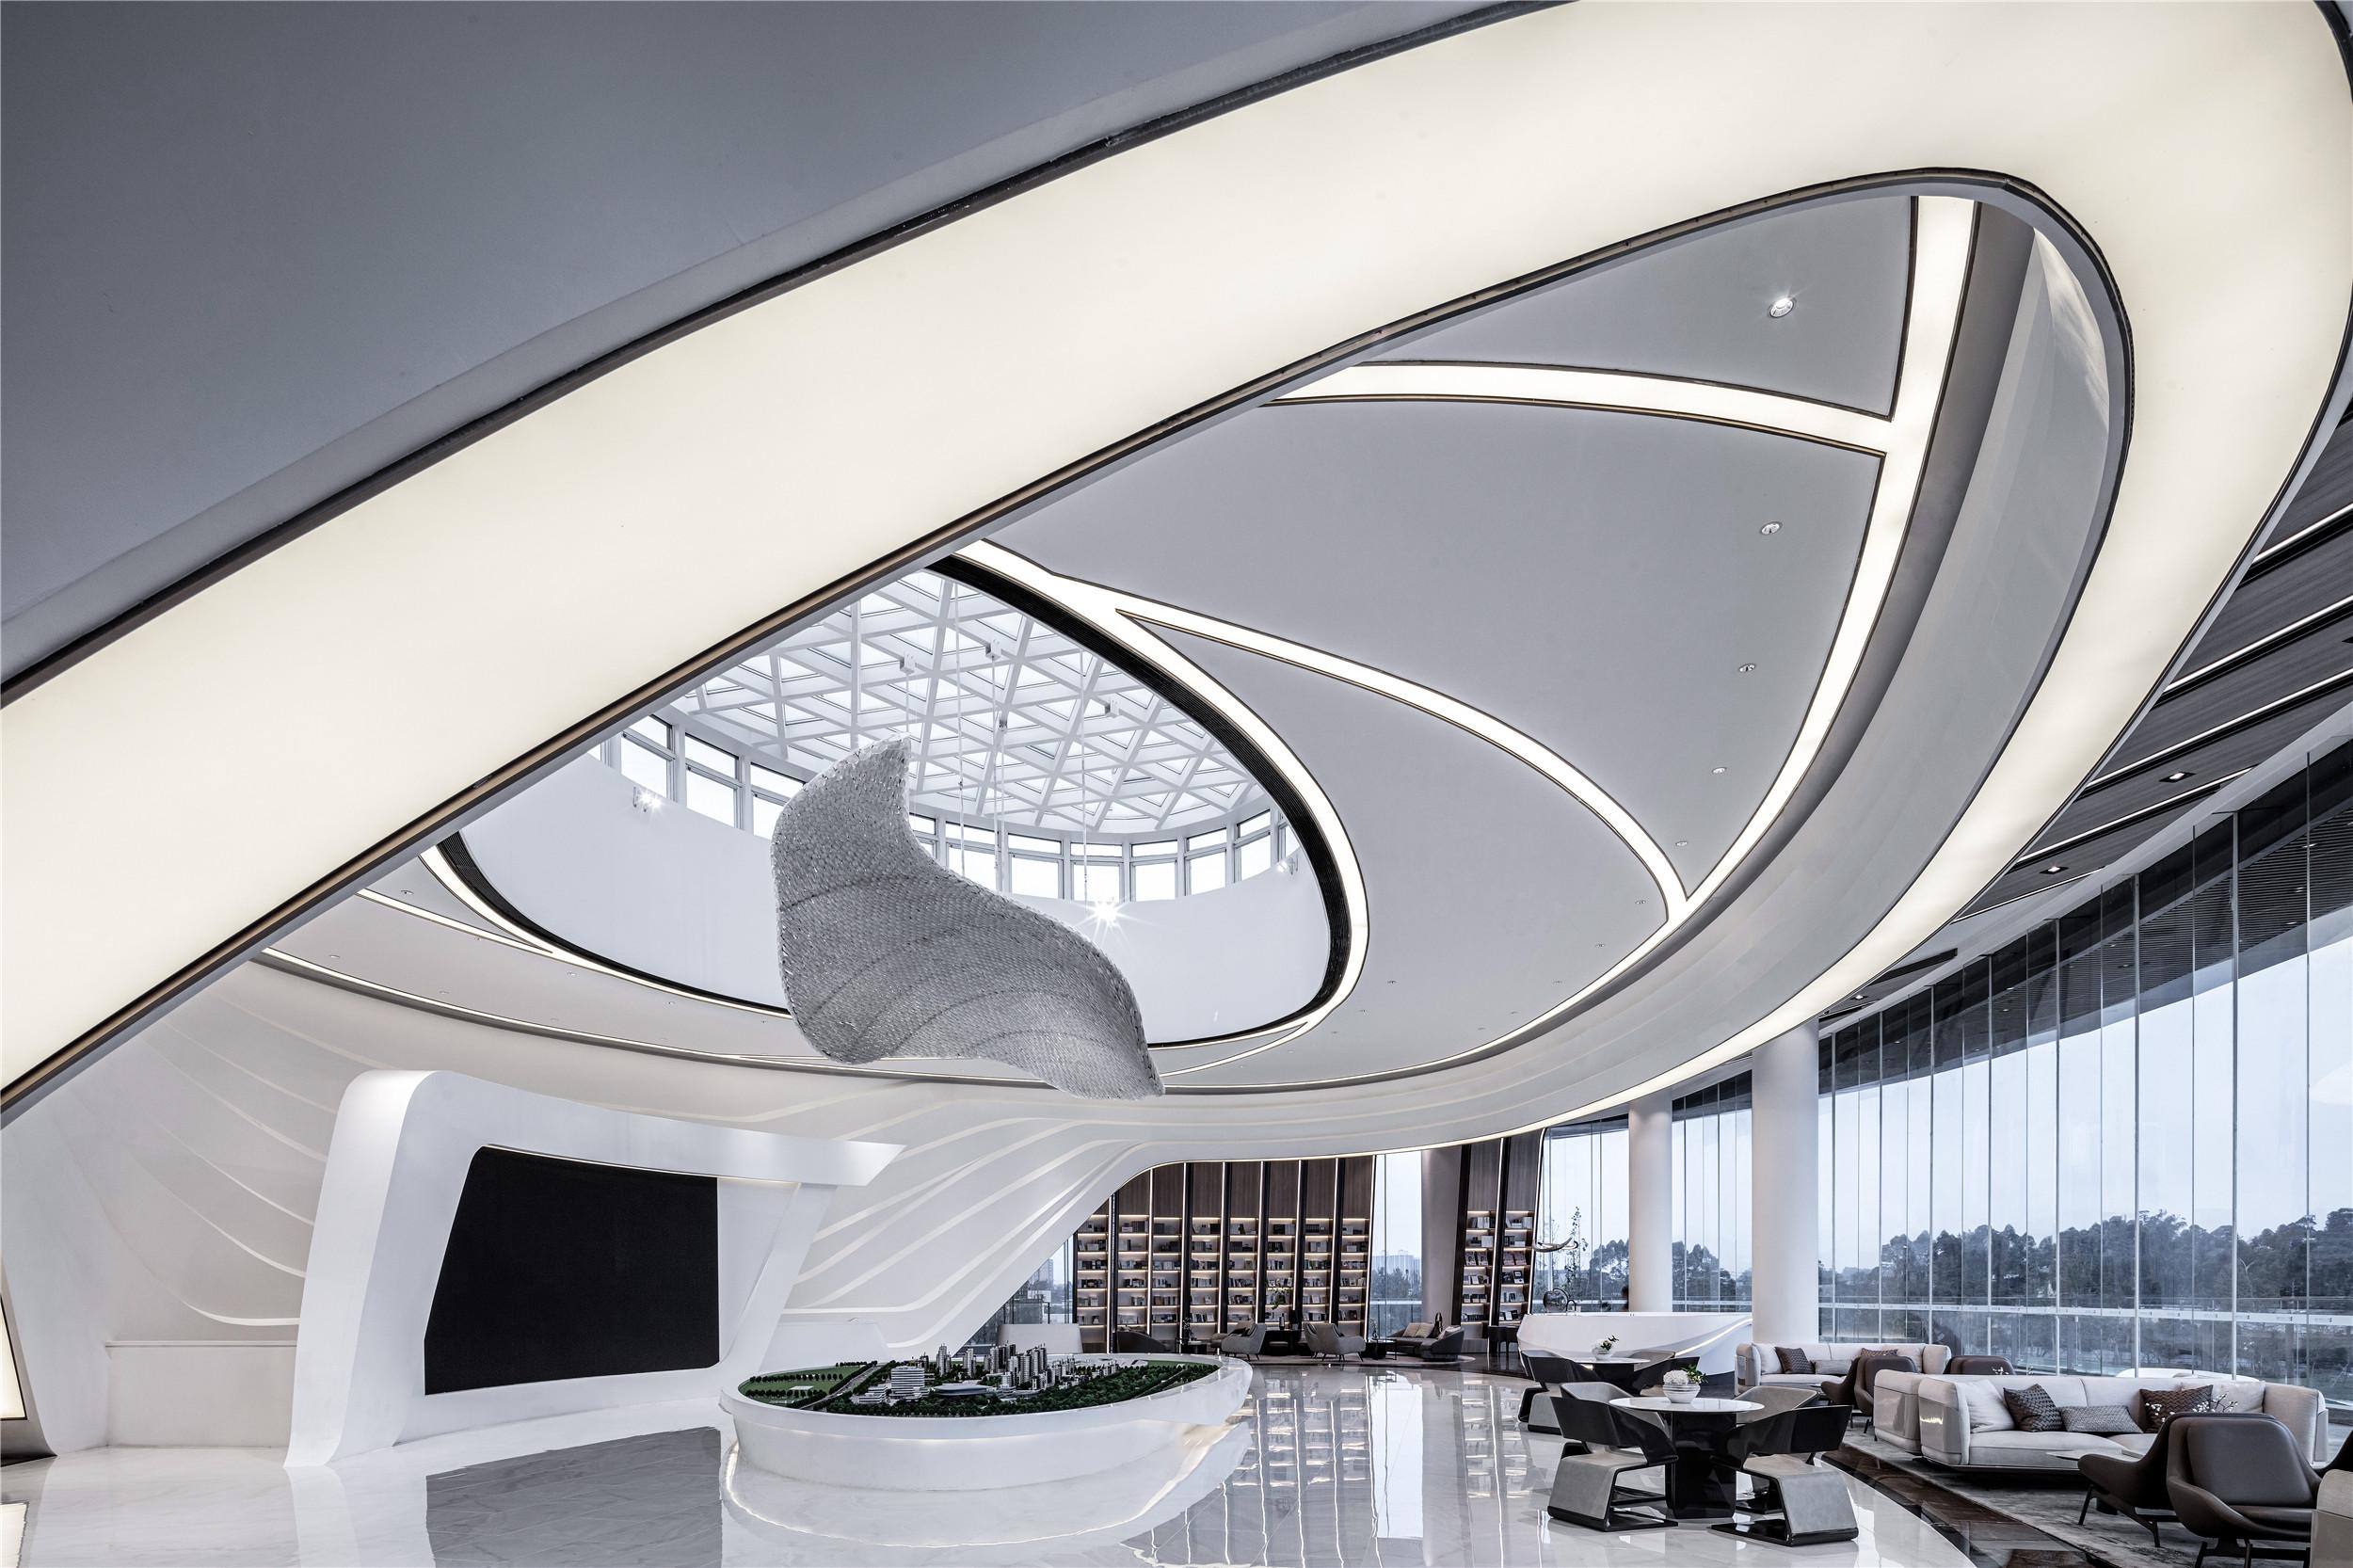 Flow by Kris Lin International Design, Chengdu, China